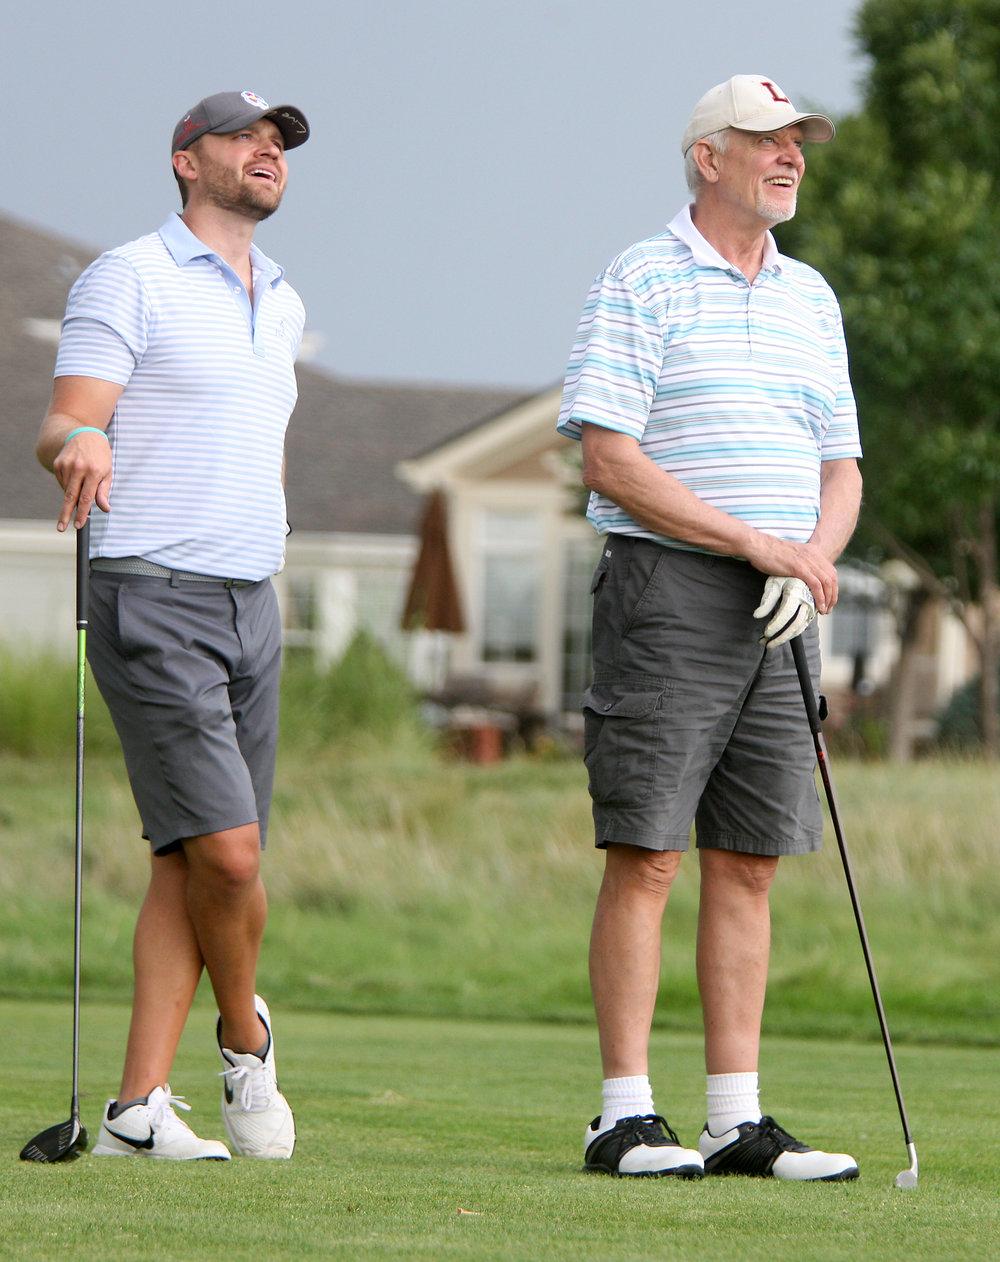 2017_Walk_With_Me_Golf_0027.JPG